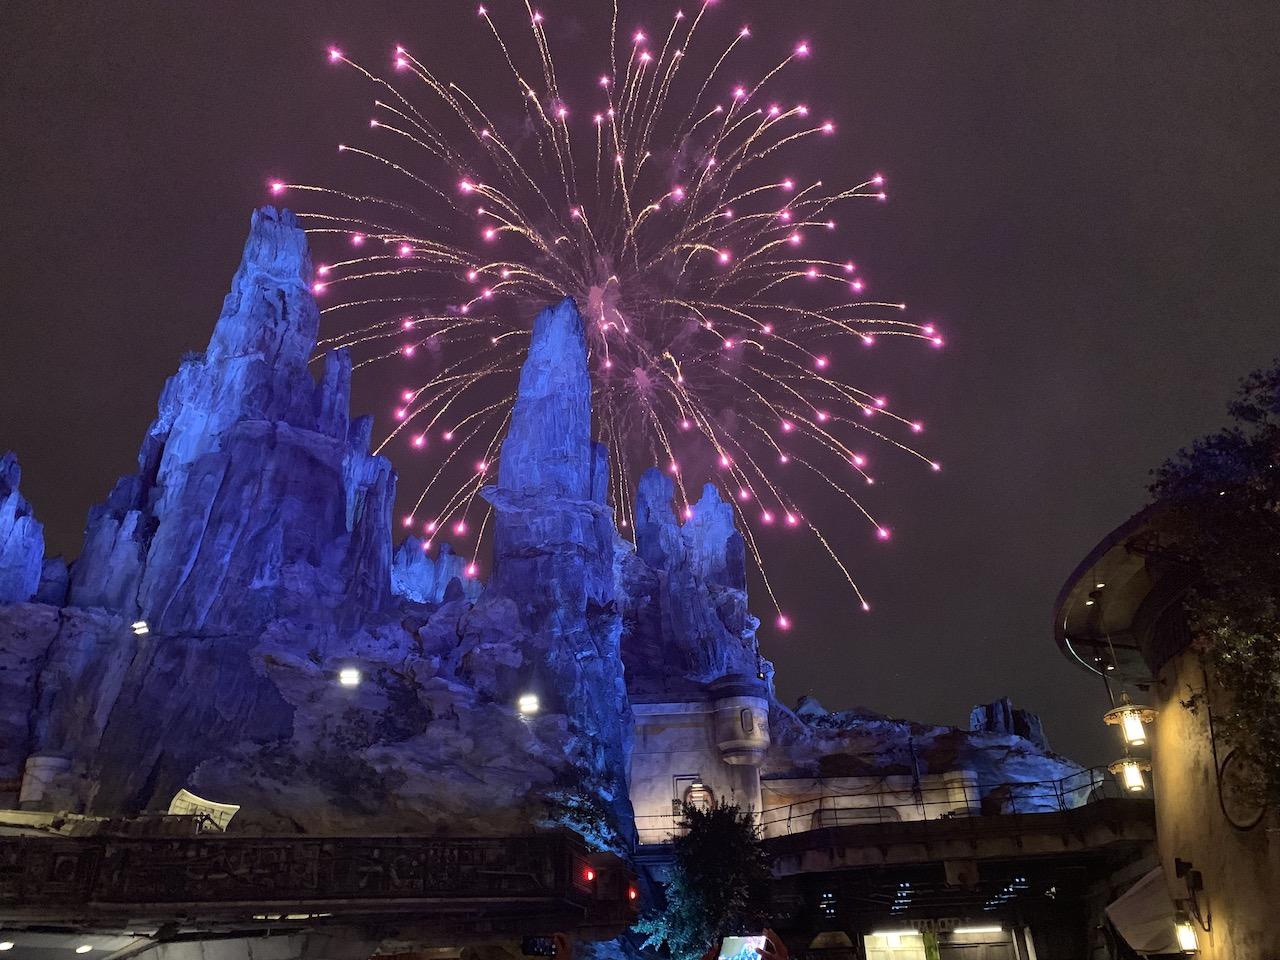 disneyland trip report june 2019 part 2 38 fireworks.jpeg